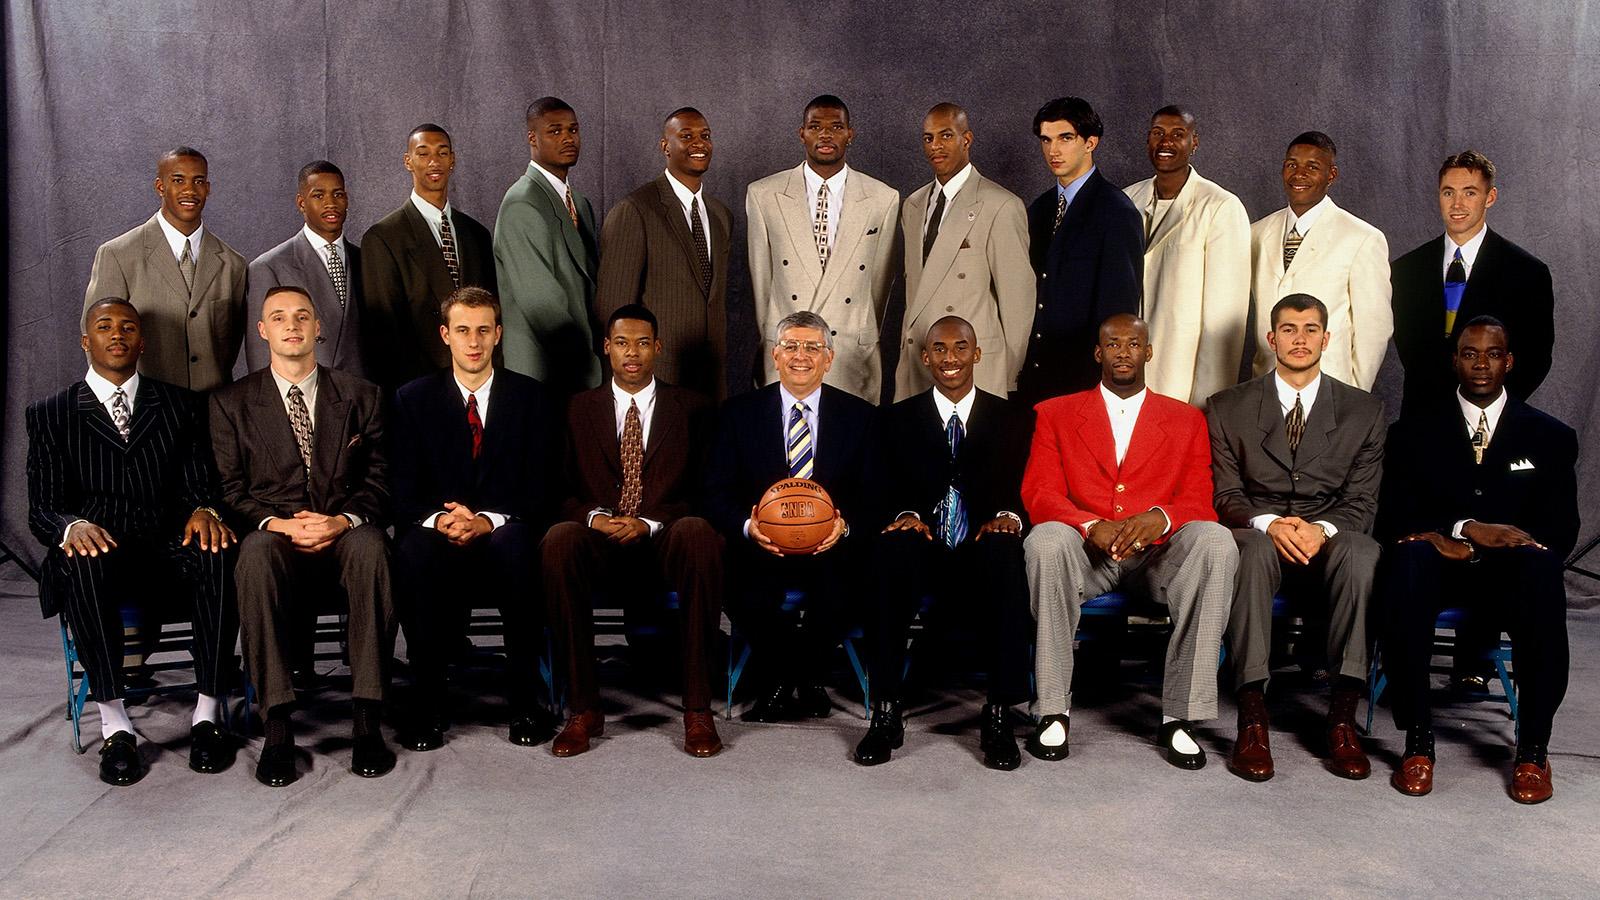 The 1996 NBA Draft Class.